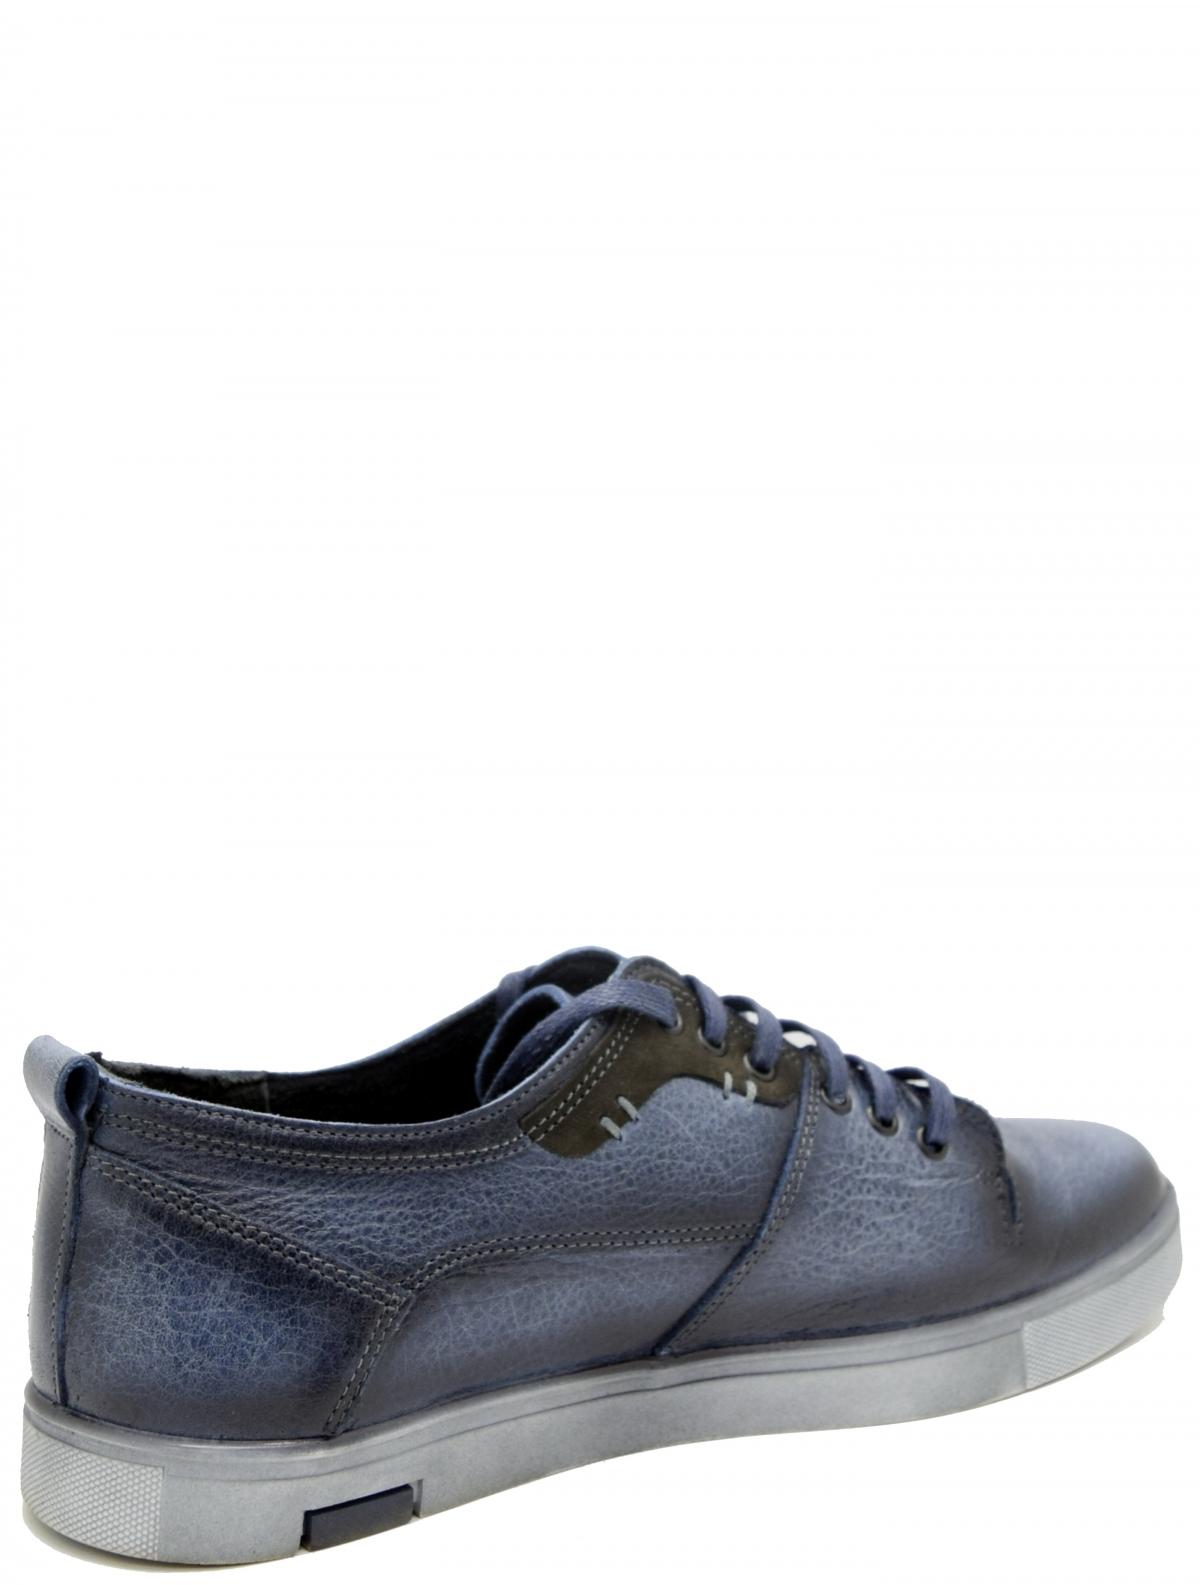 Rooman 500-274-N3C мужские туфли